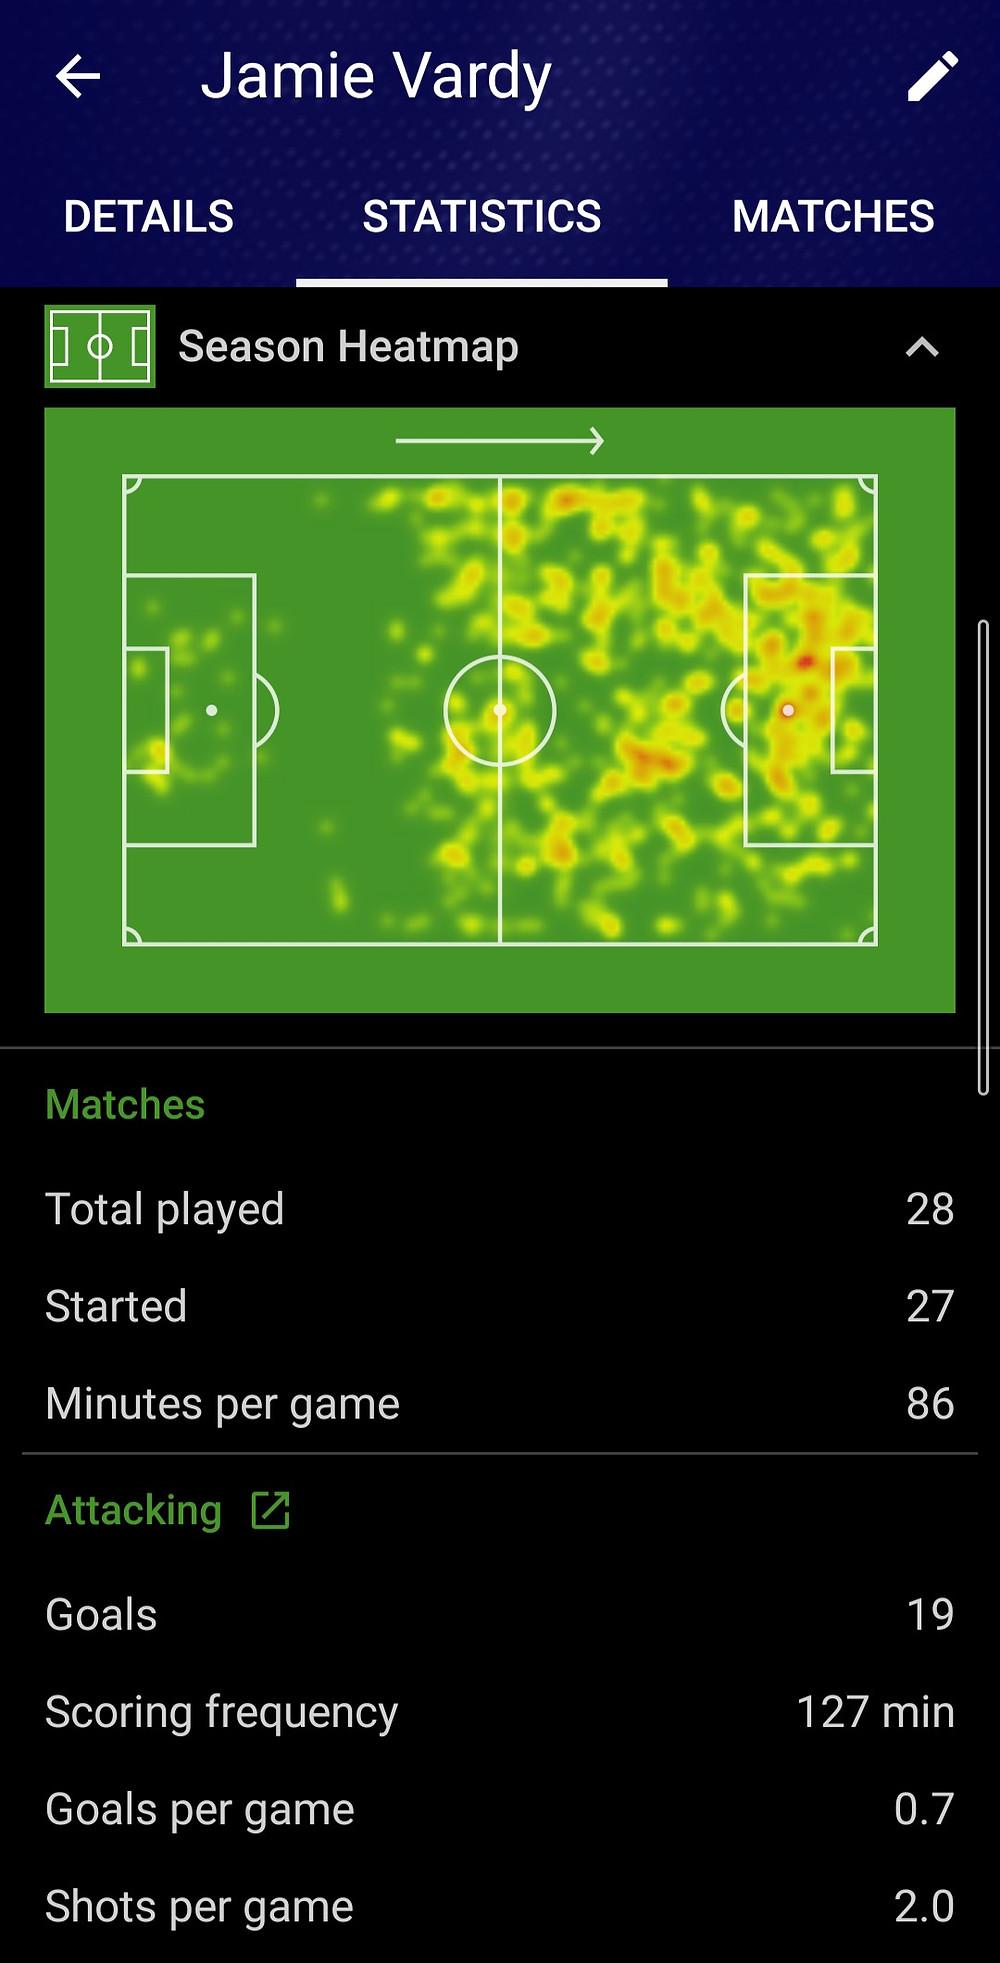 Jamie Vardy 2019/20 Football Season SofaScore Stats